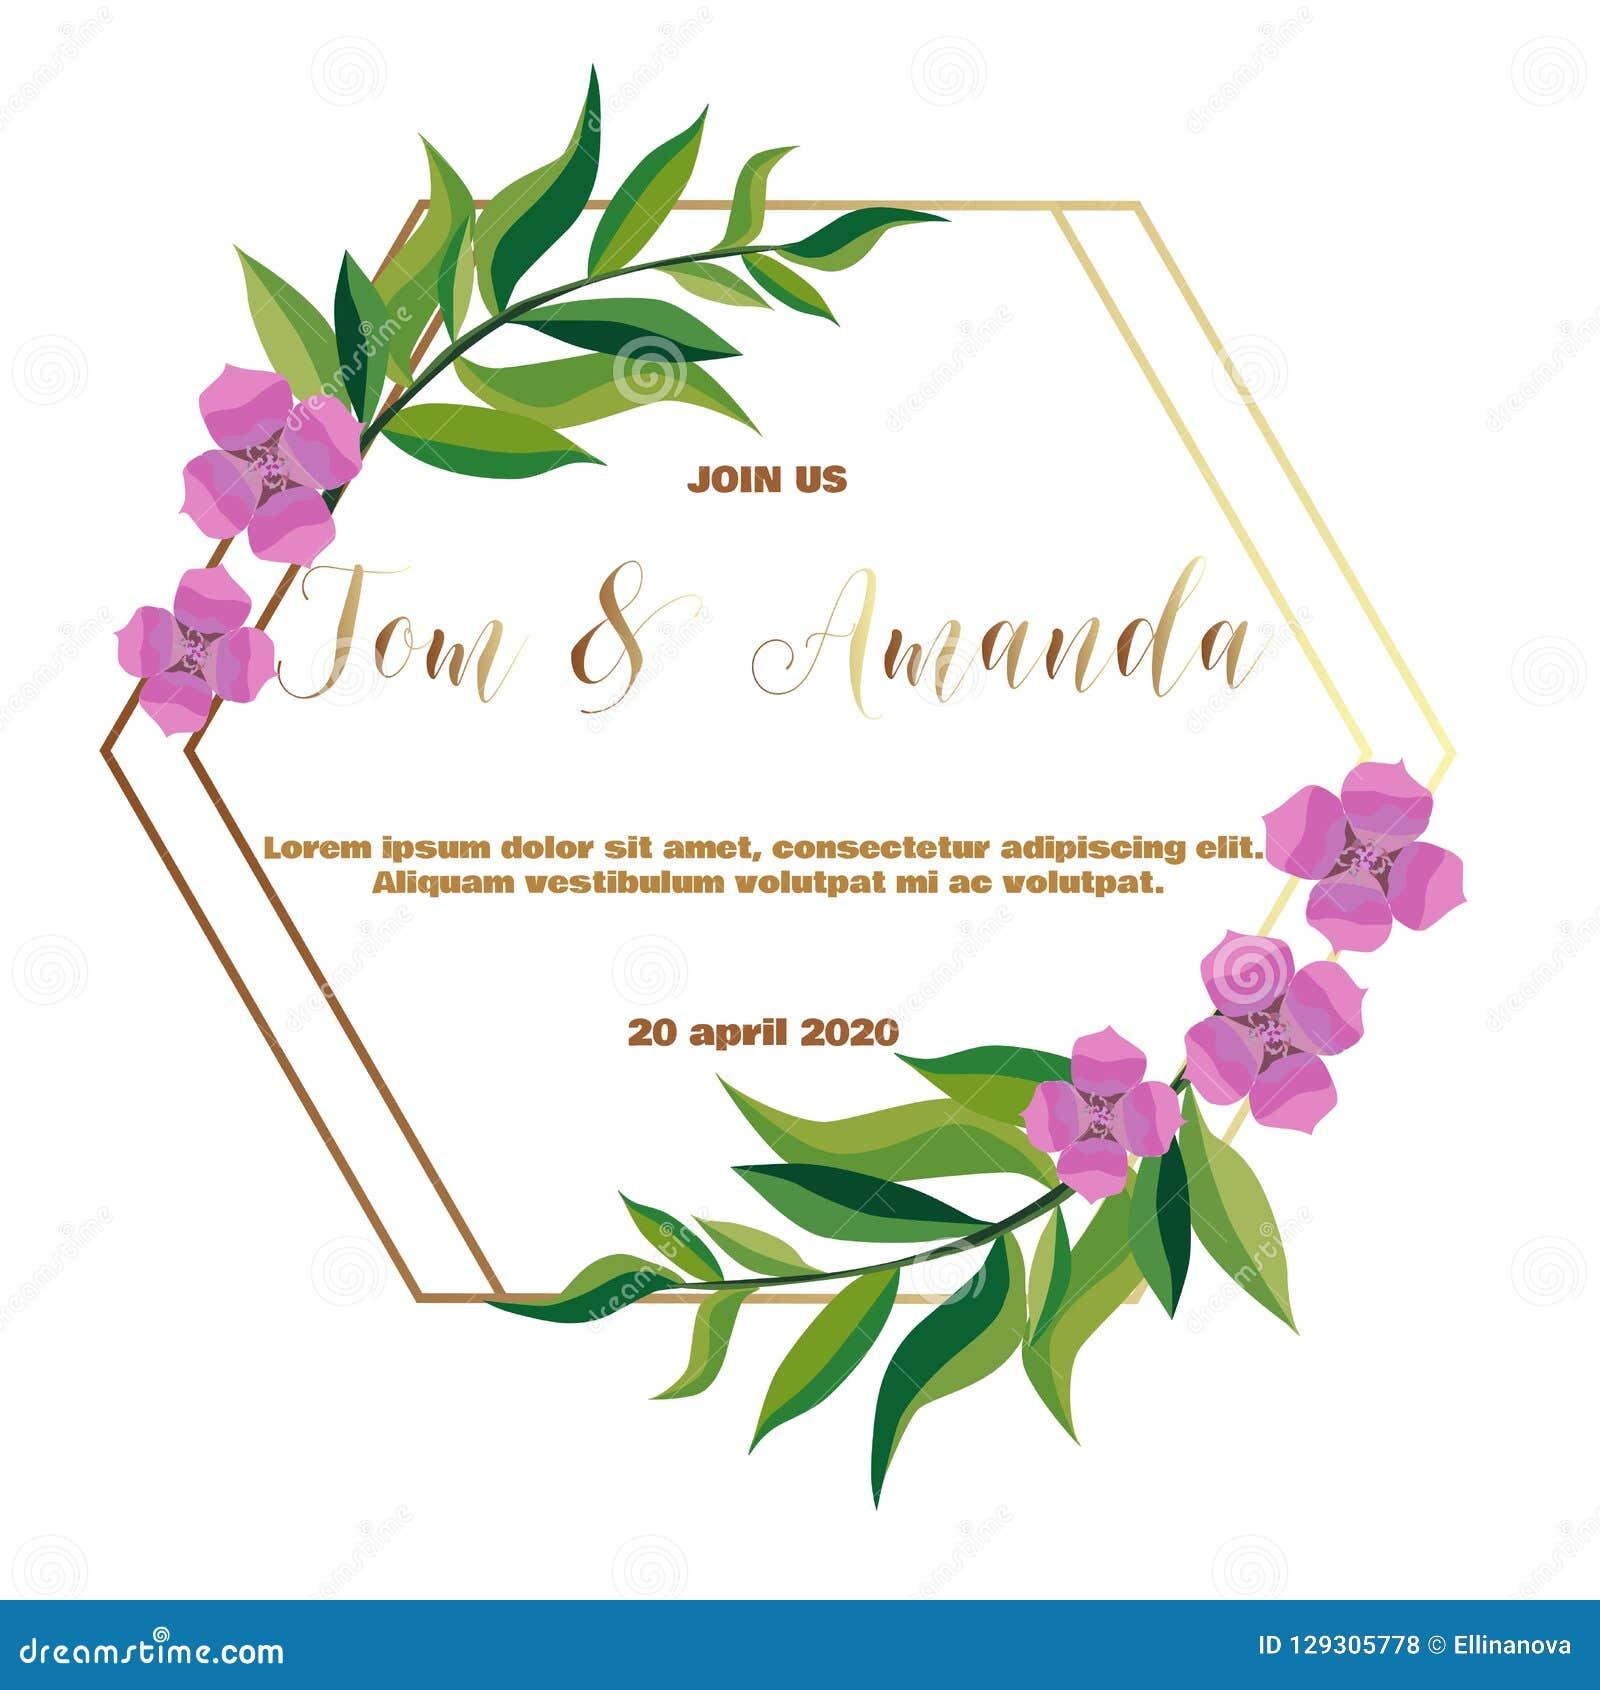 Wedding Invitation Templates.Greenery Wedding Invitation Template Stock Vector Illustration Of